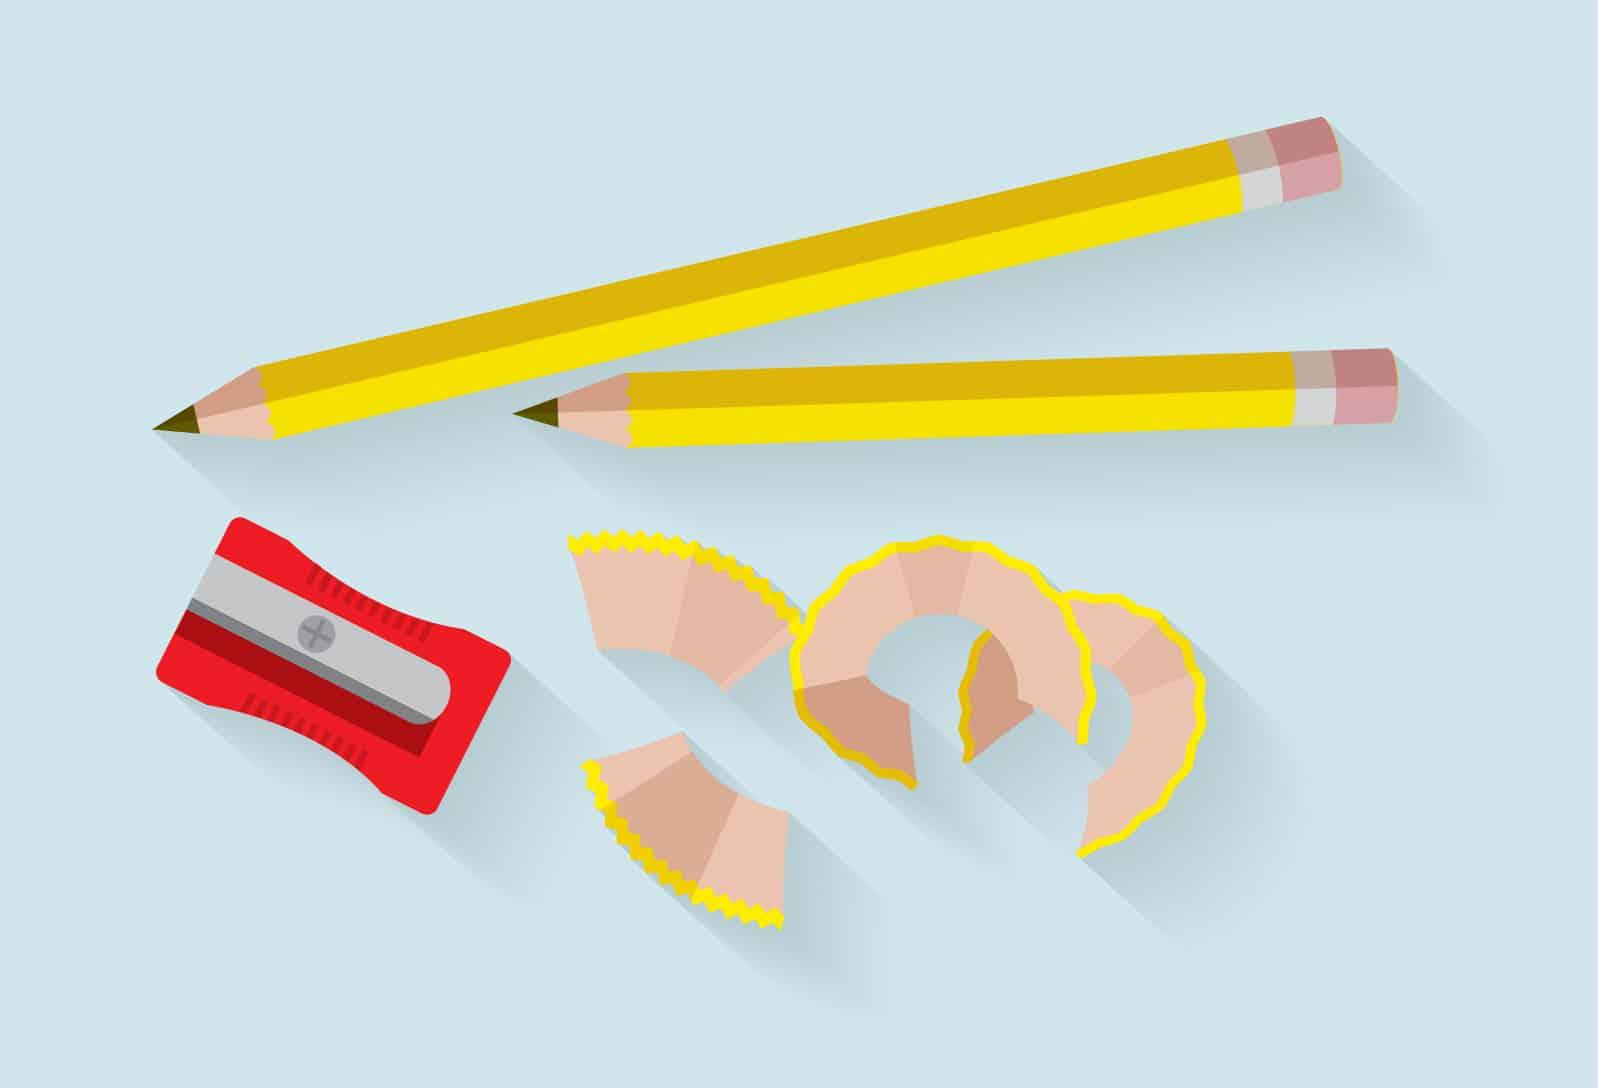 content writing 2 pencils